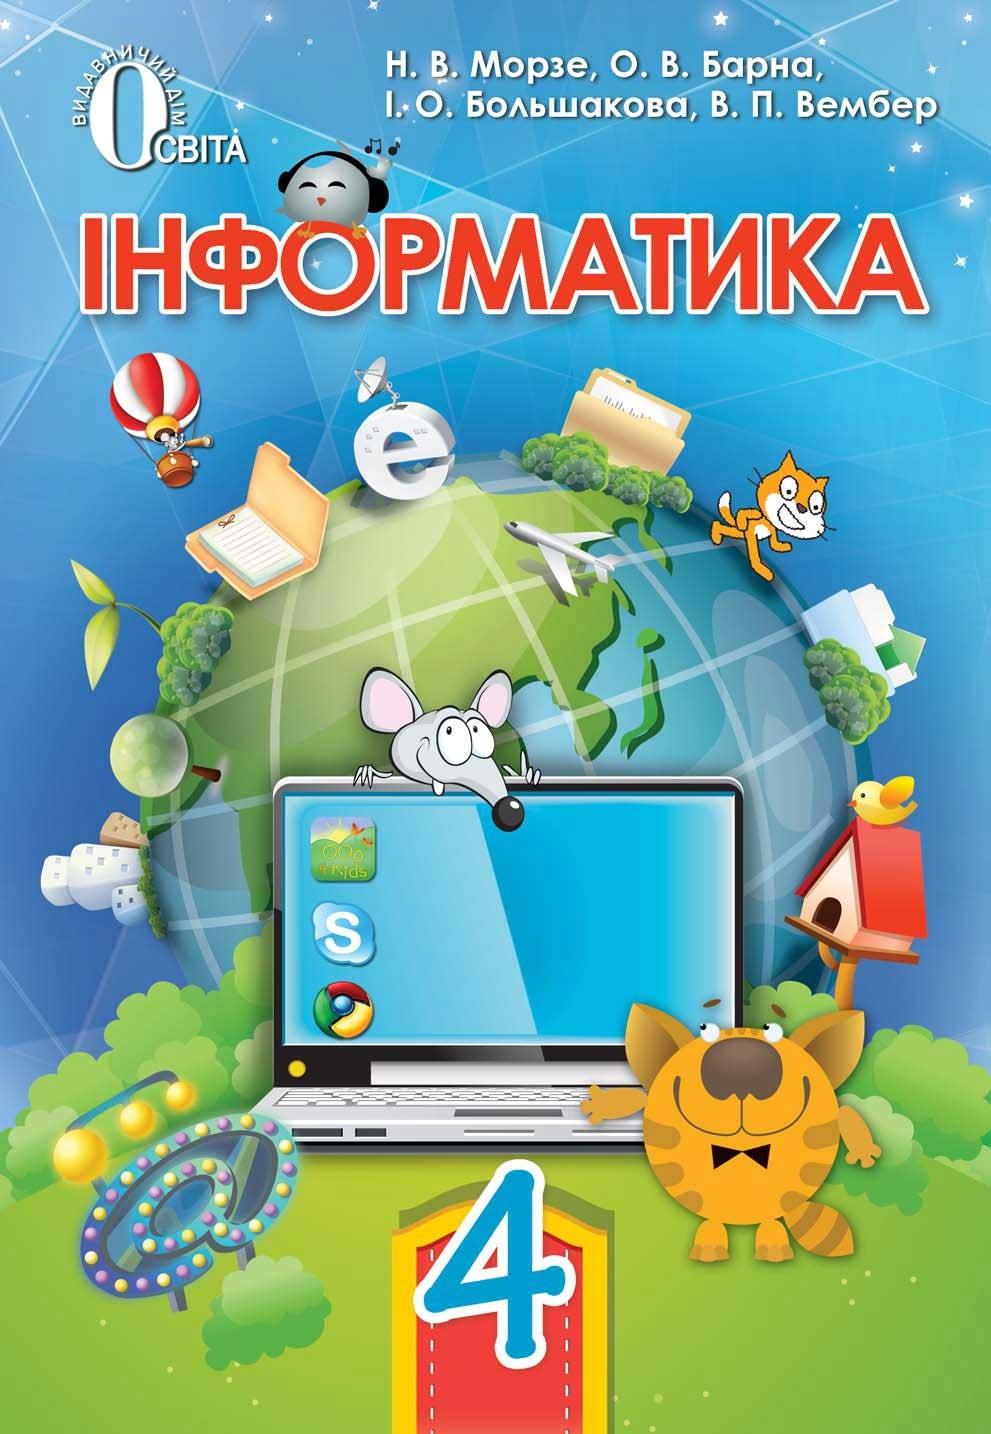 К информатика класс учебнику н.в. морзе гдз 6